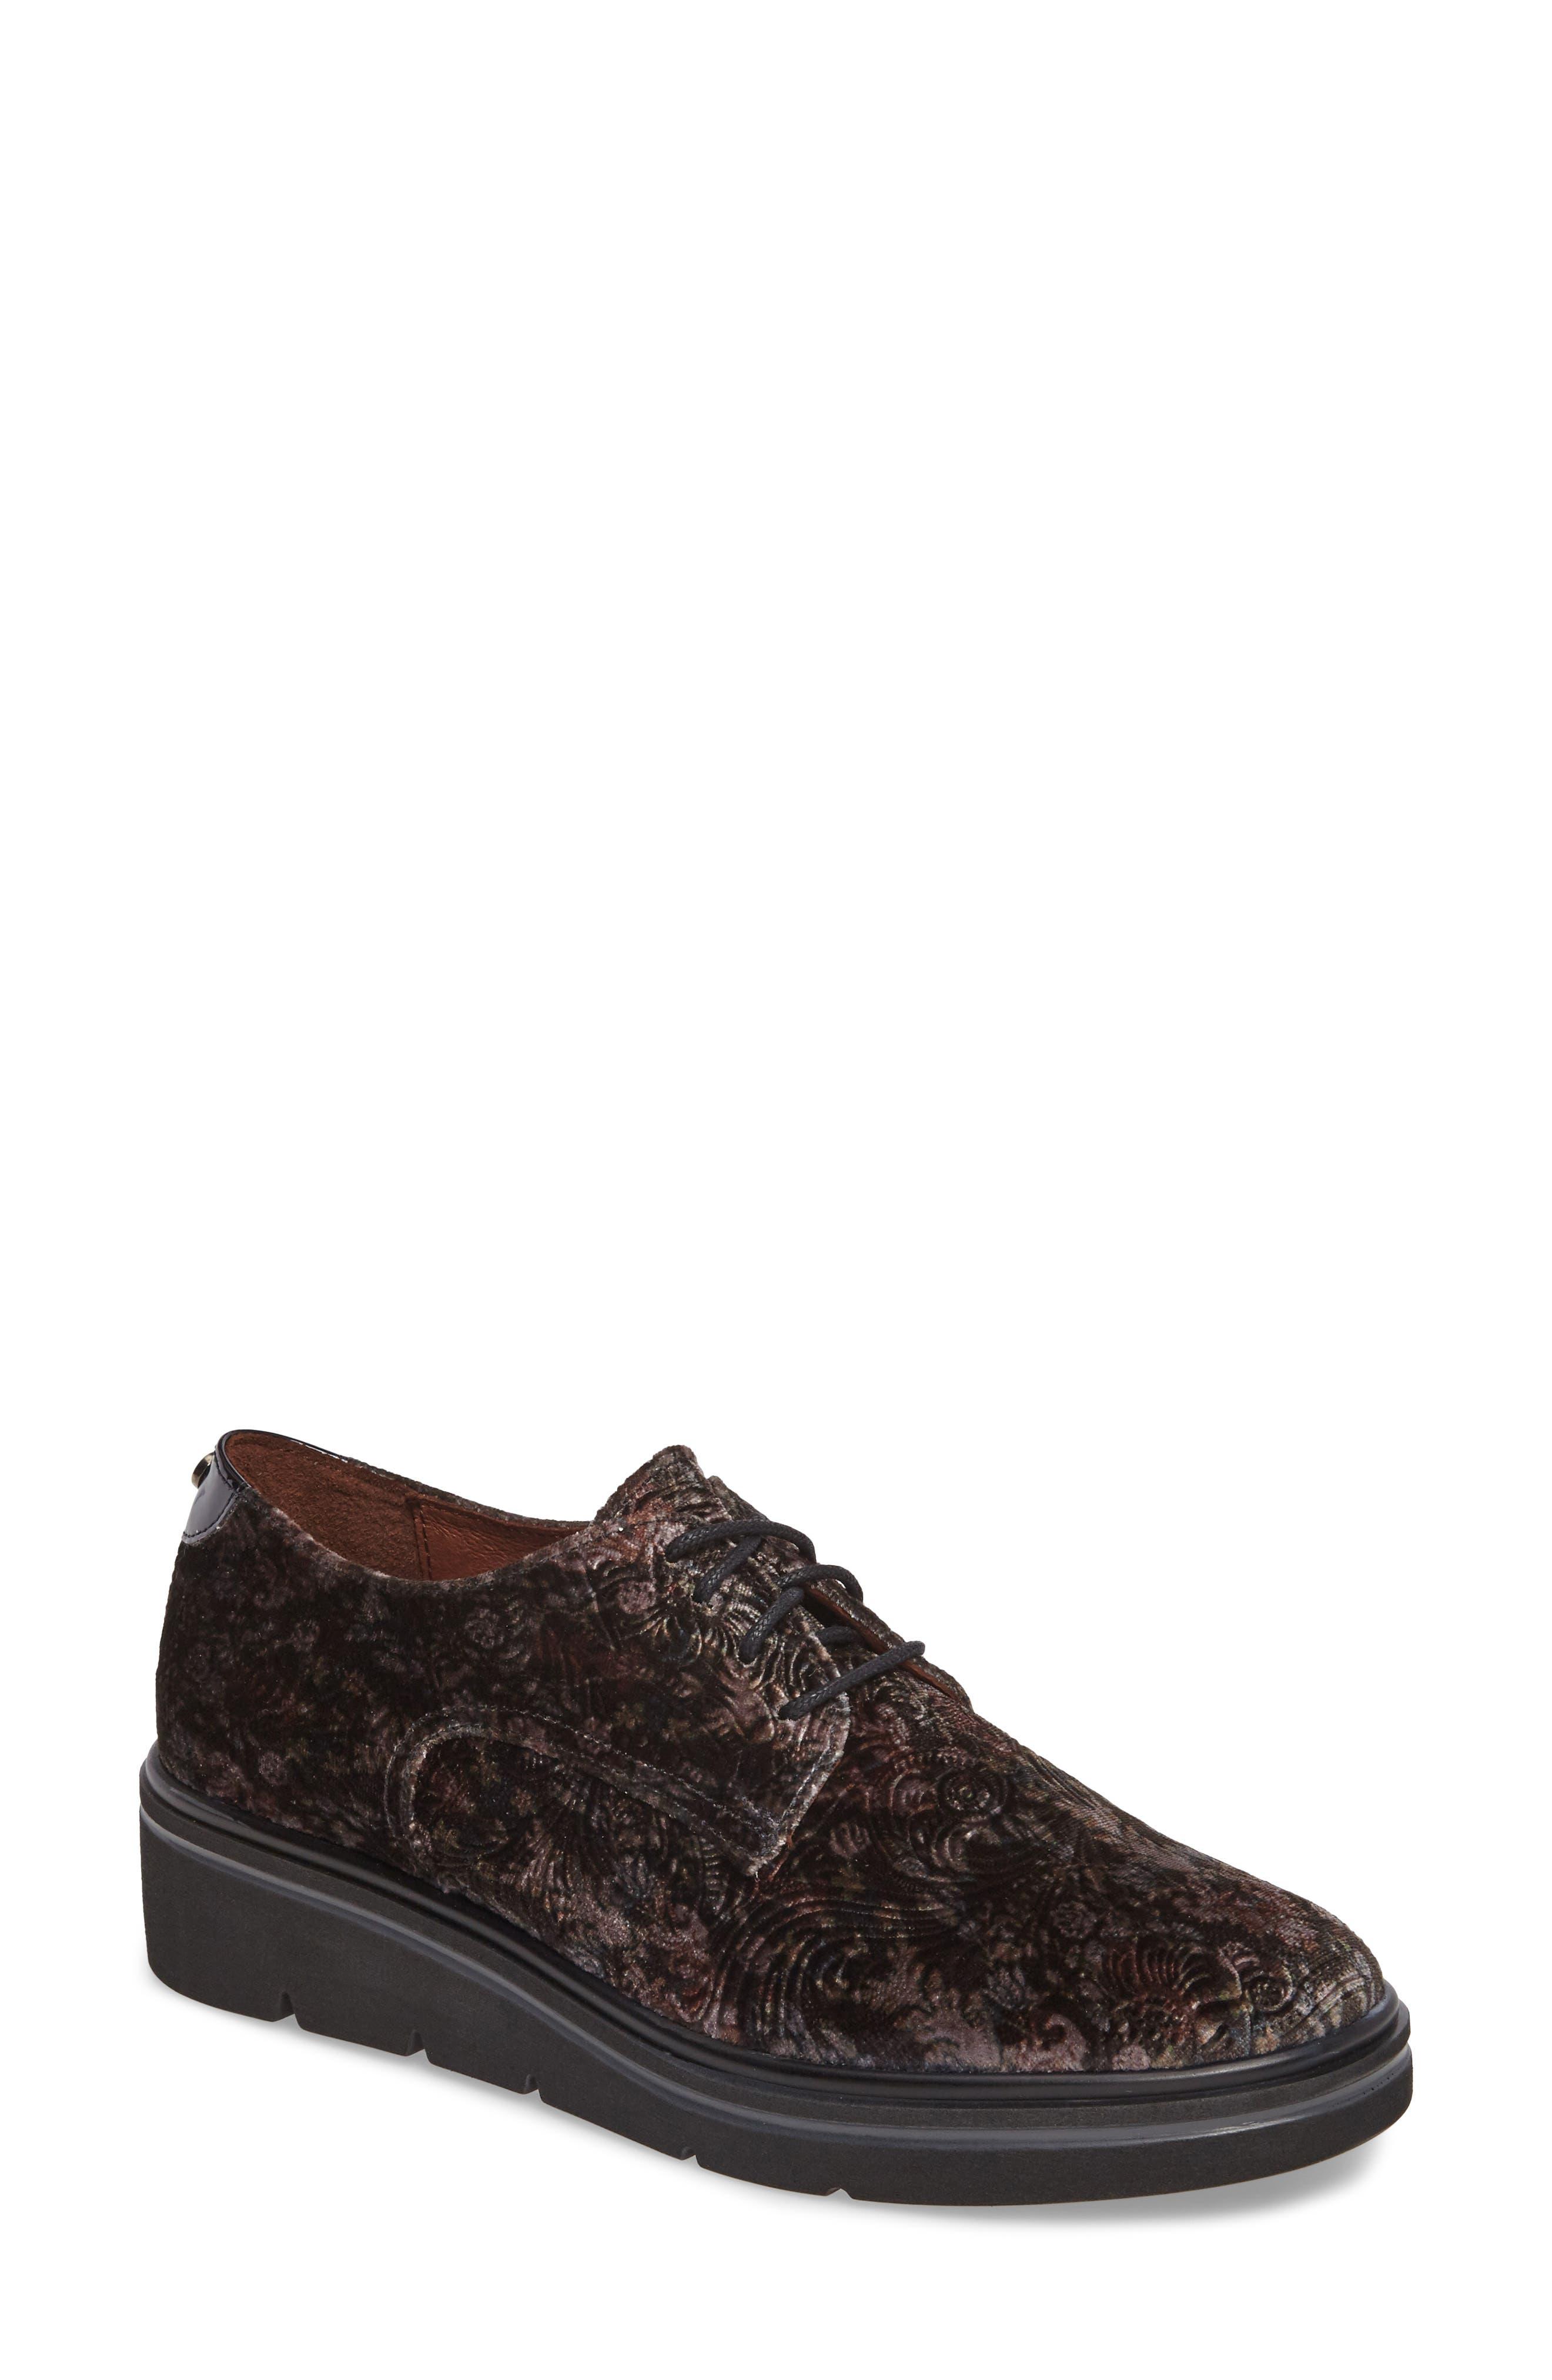 HISPANITAS, Richelle Oxford Sneaker, Main thumbnail 1, color, GREY FABRIC